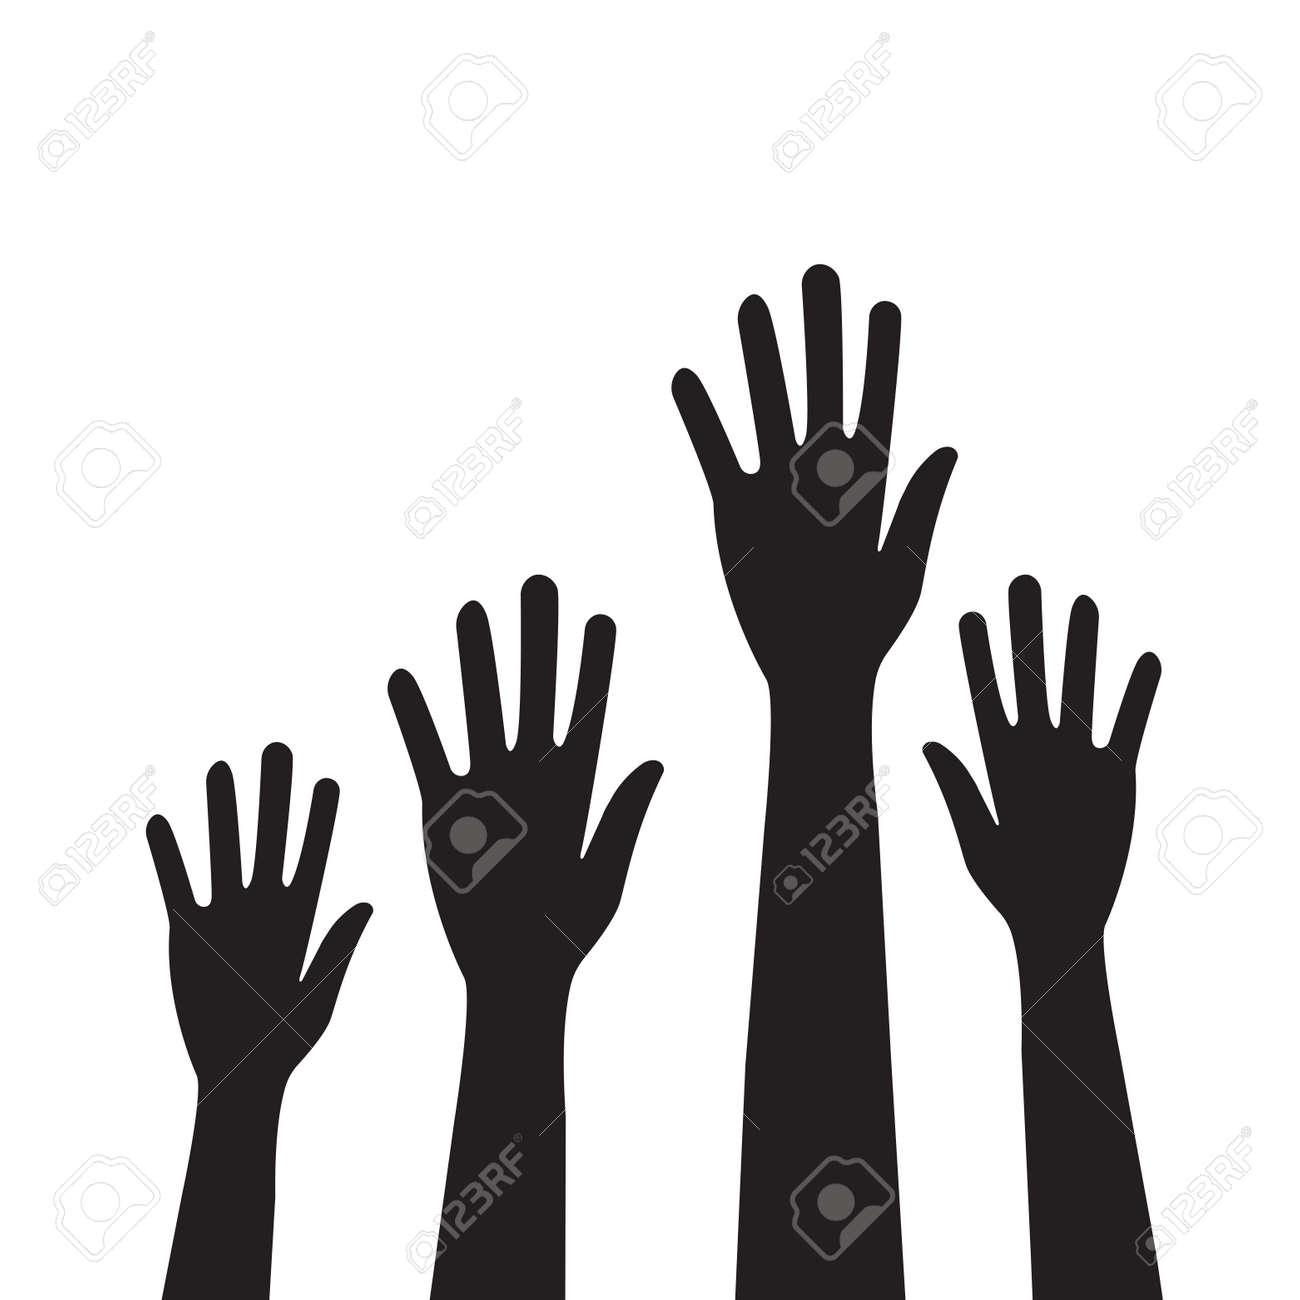 People hands raised vector for graphic design, logo, web site, social media, mobile app, ui illustration - 169916418